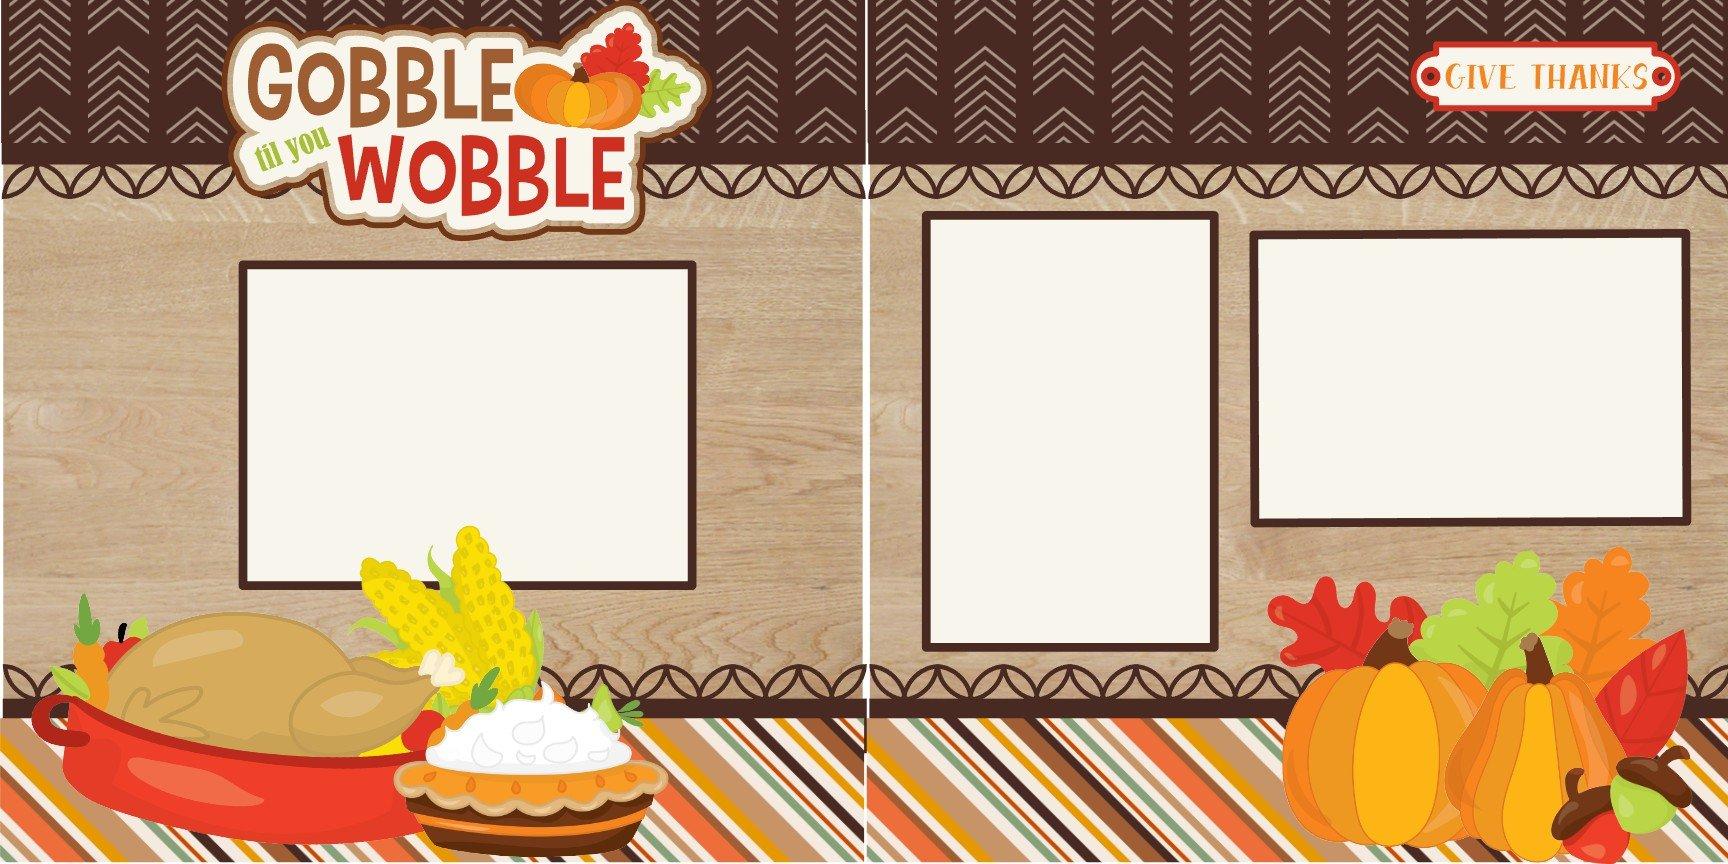 Goggle til you Wobble - 2pg layout